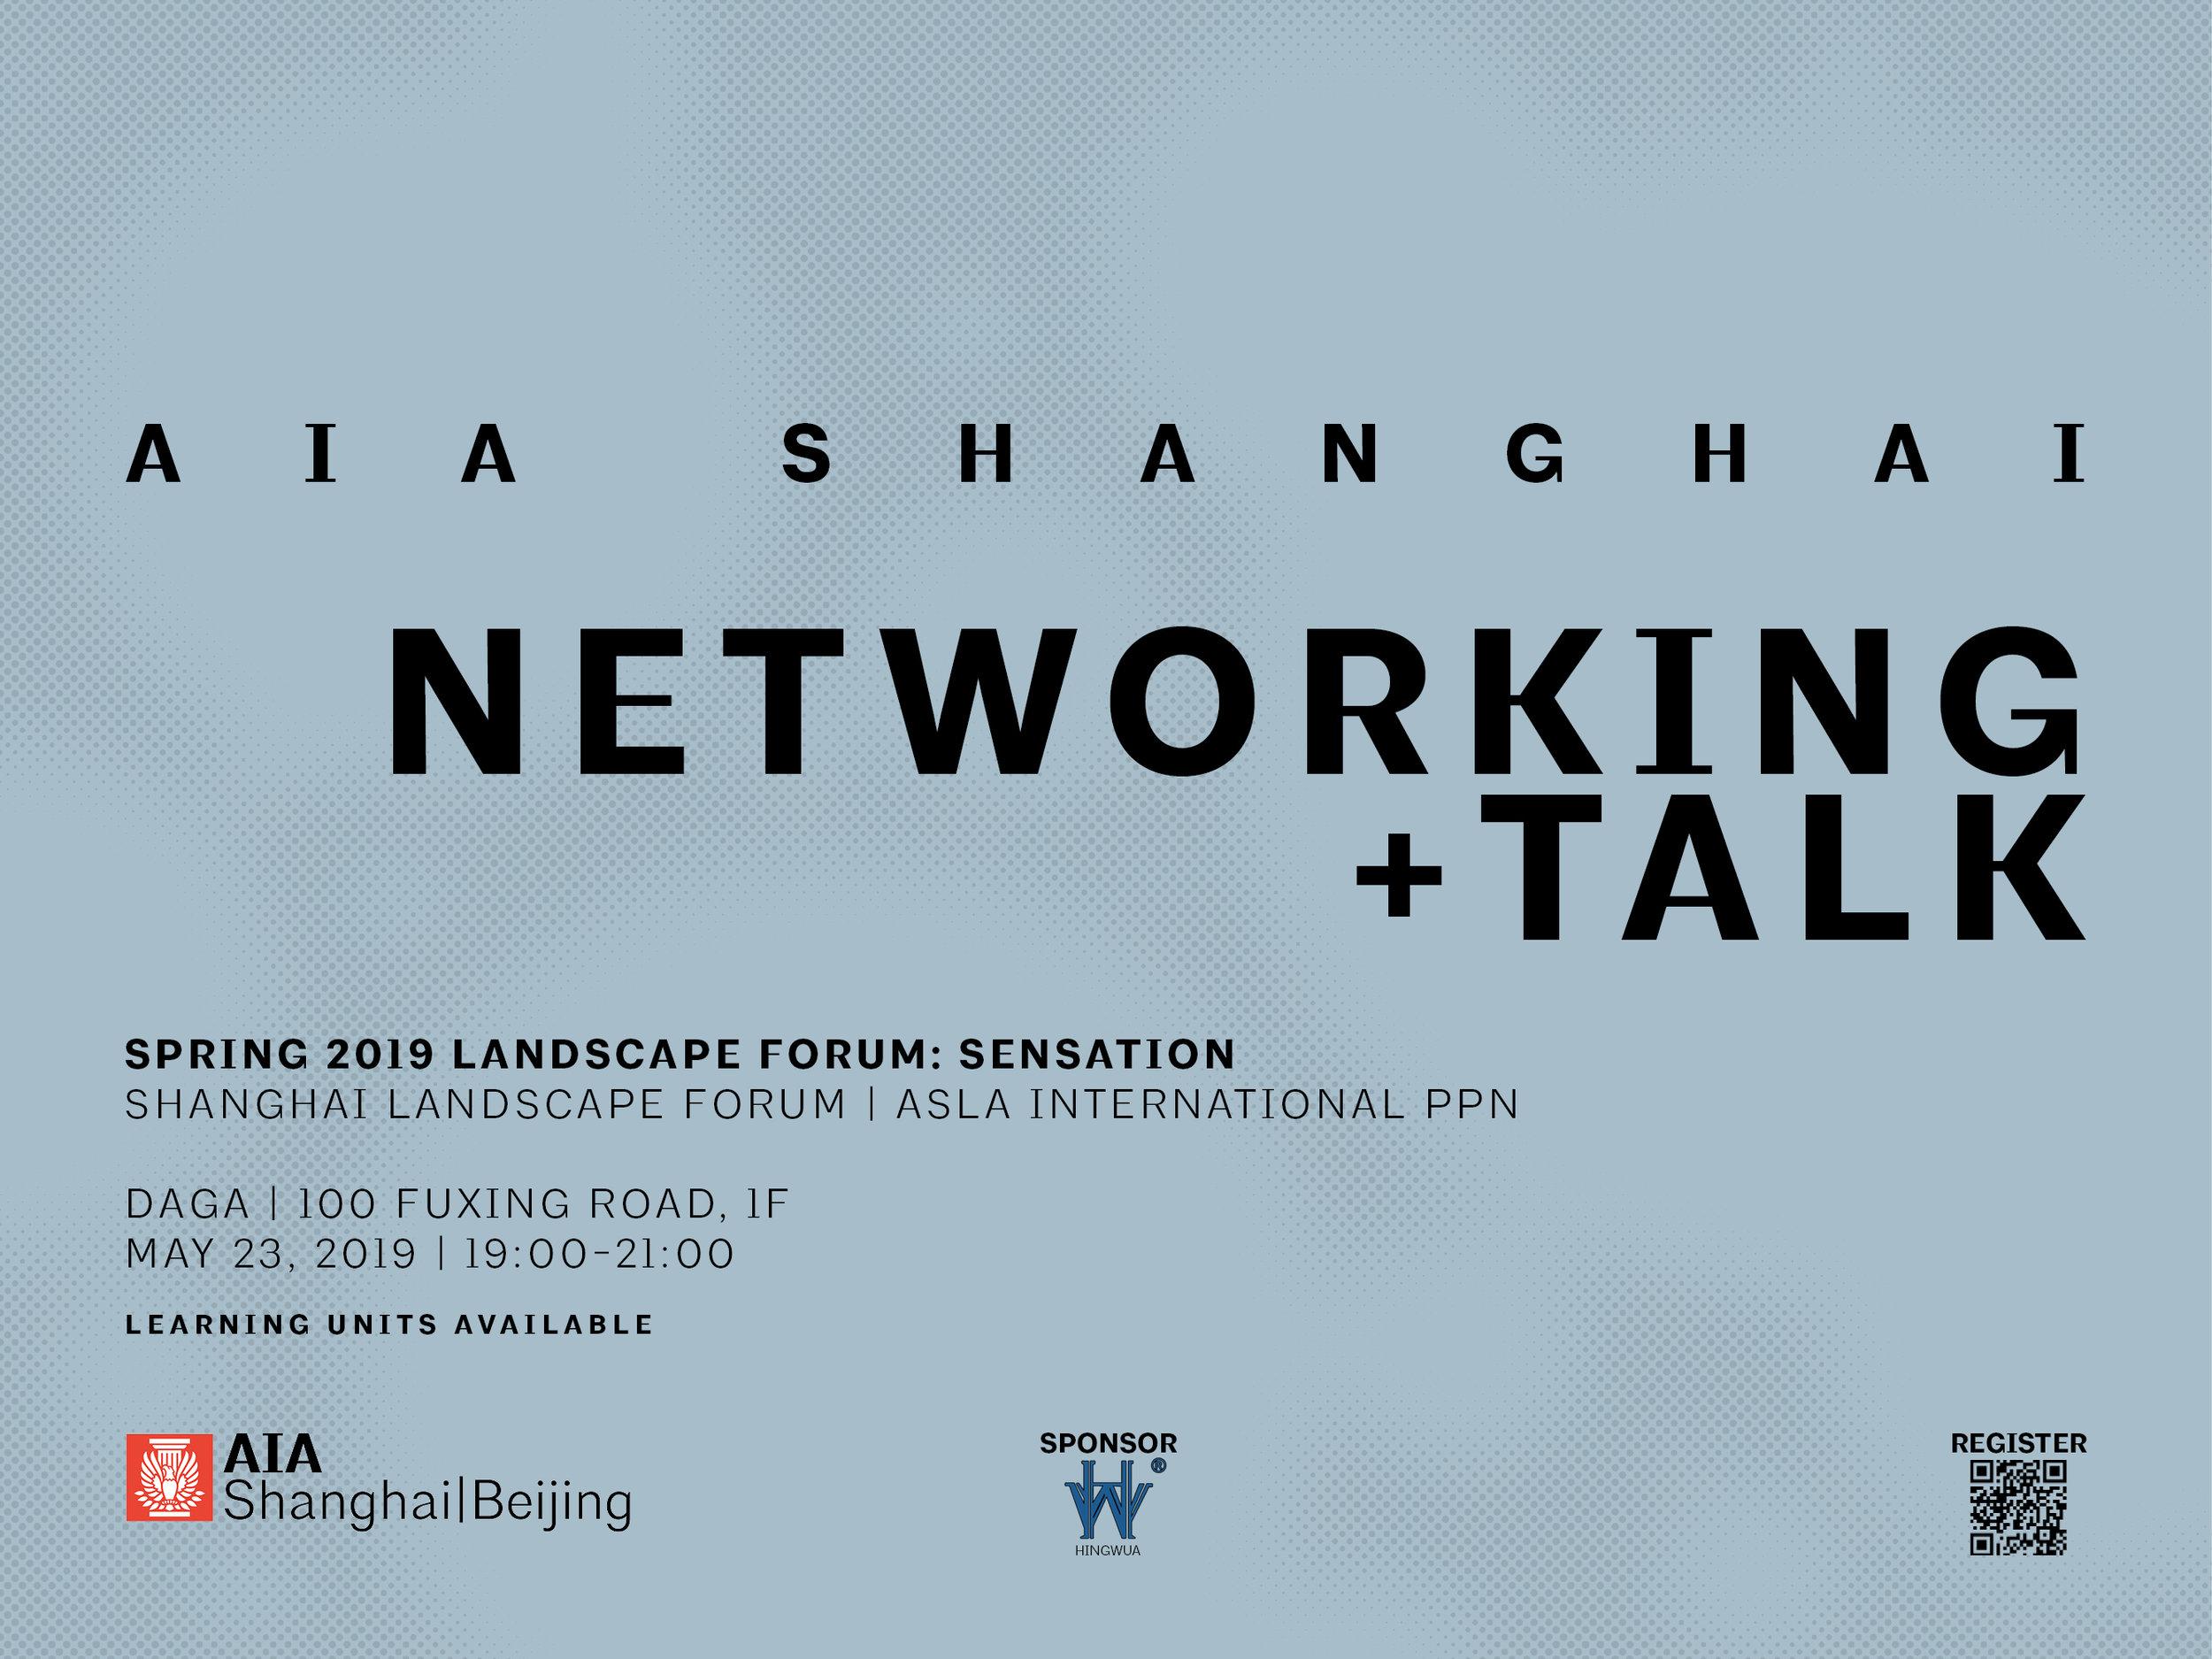 Networking + Talk | Shanghai Landscape Forum | ASLA